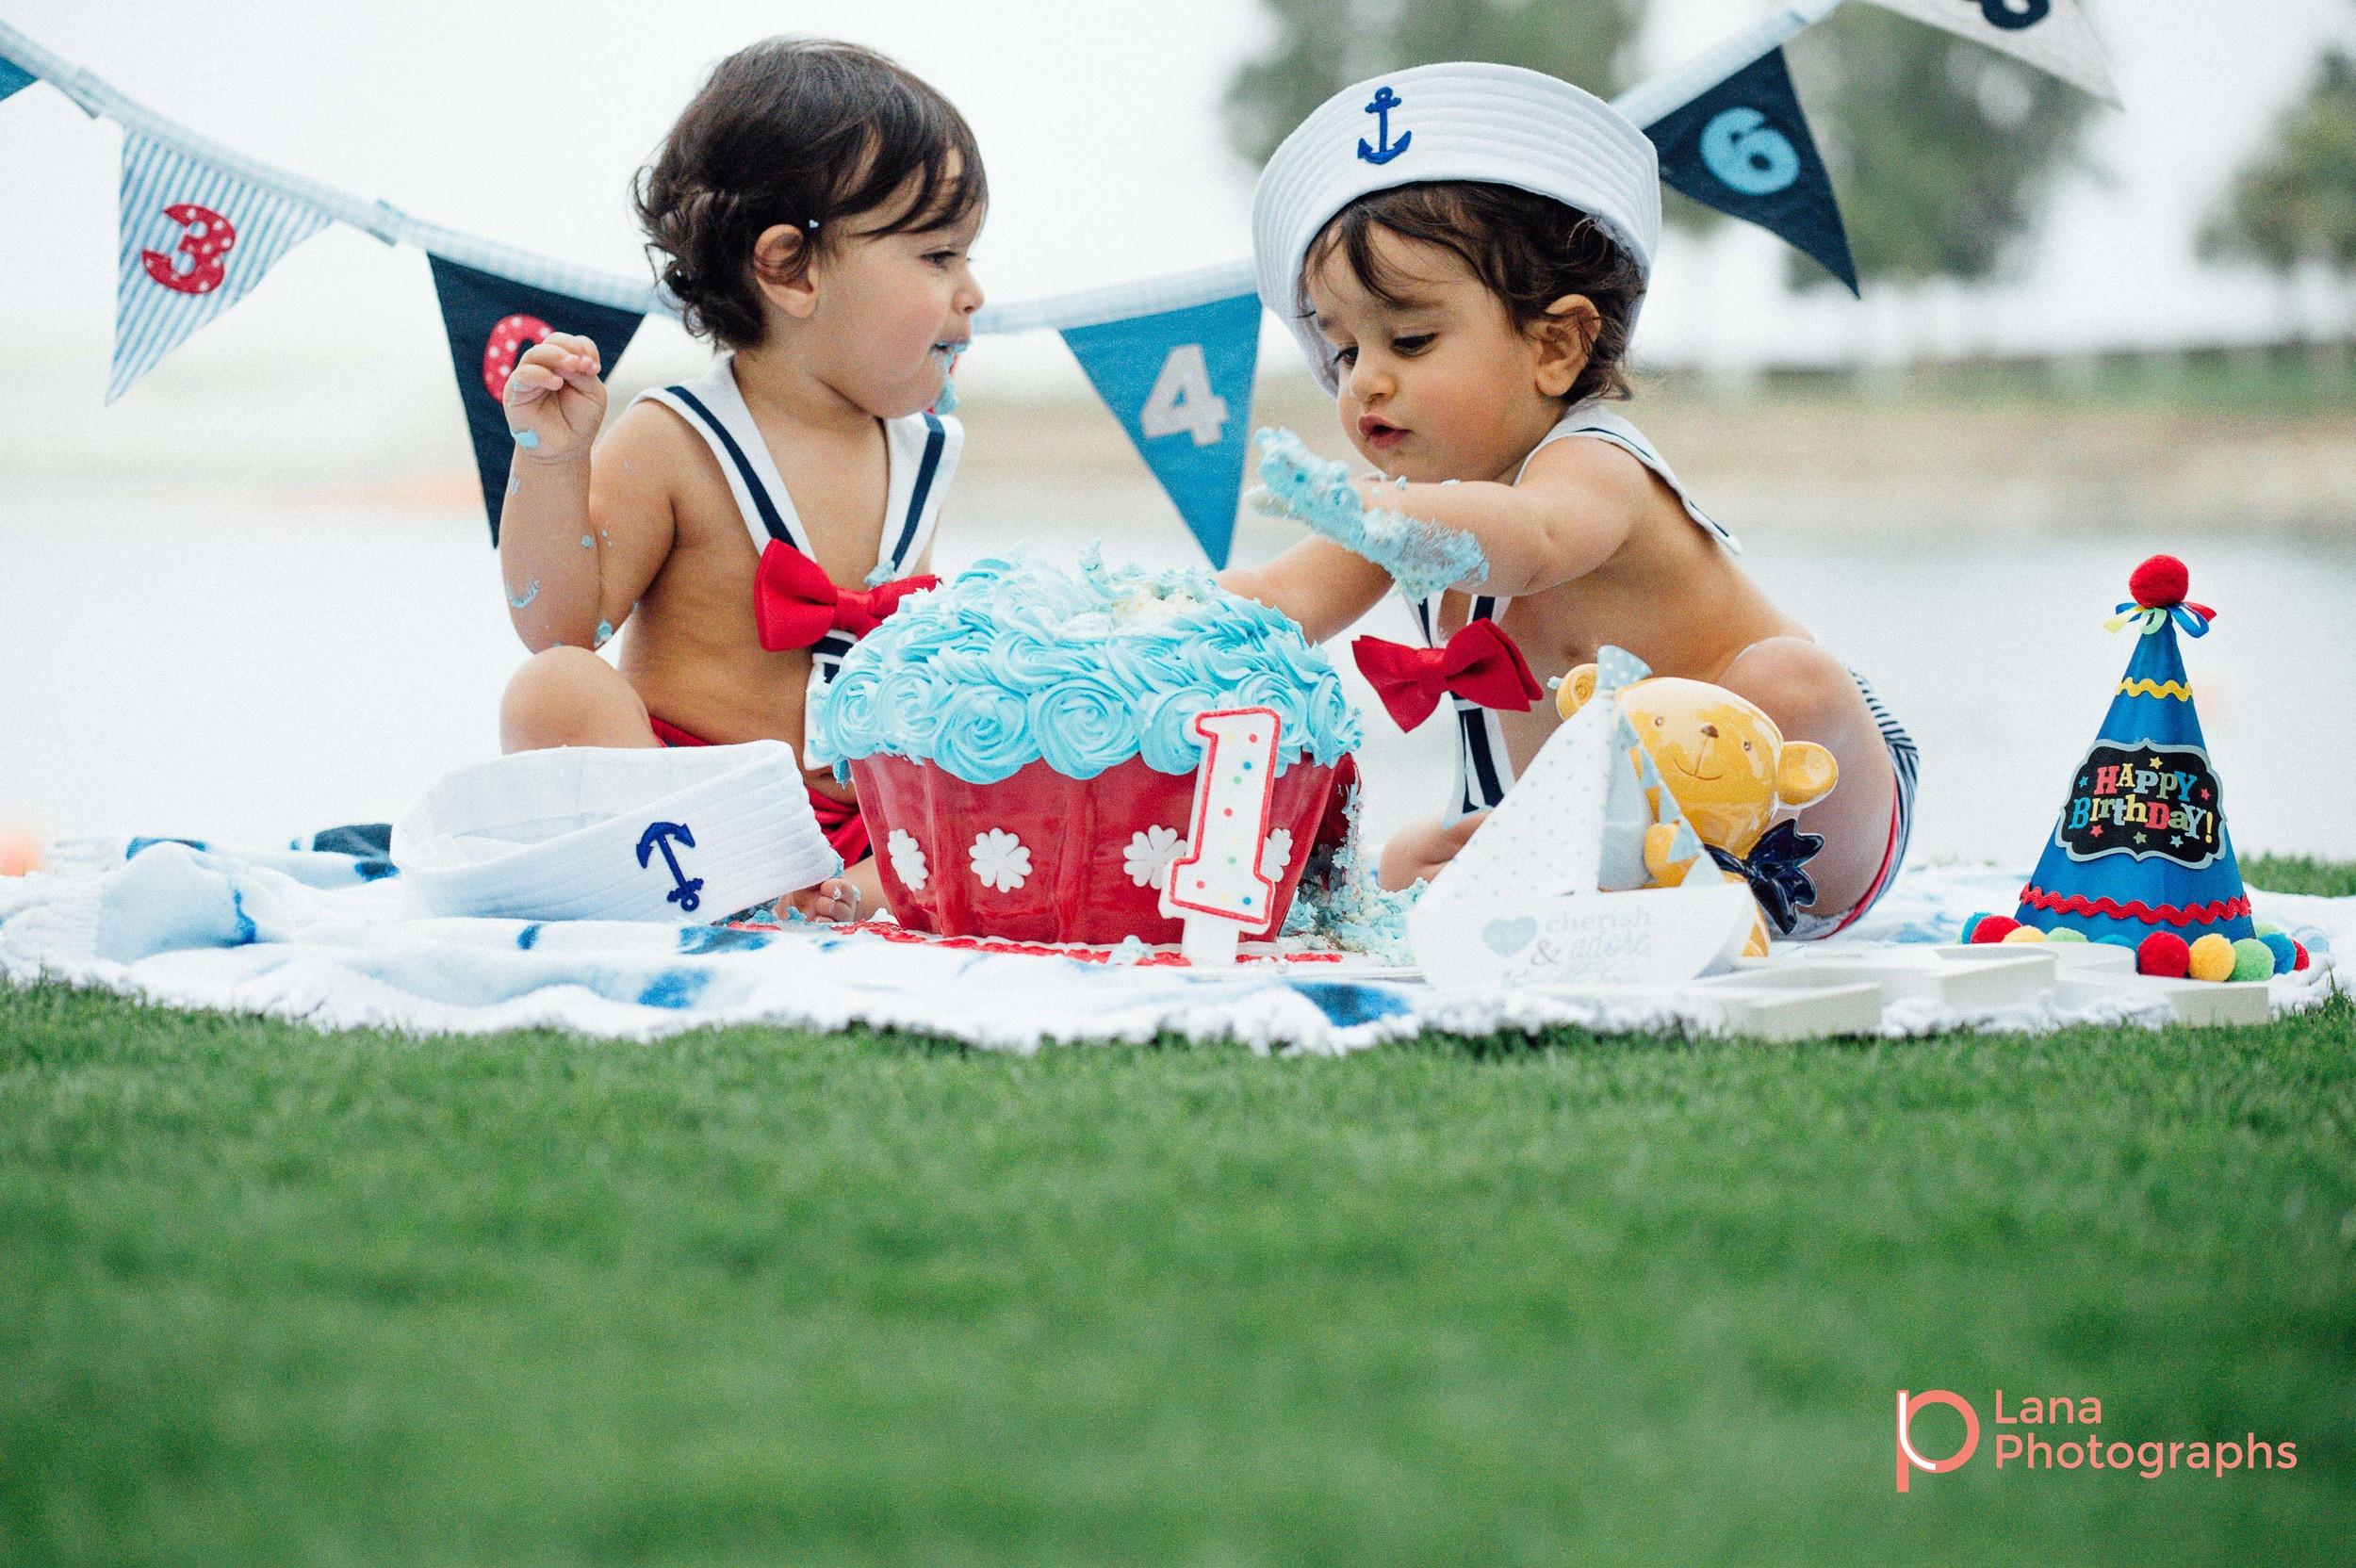 Family Beach Session in Abu-Dhabi, UAE